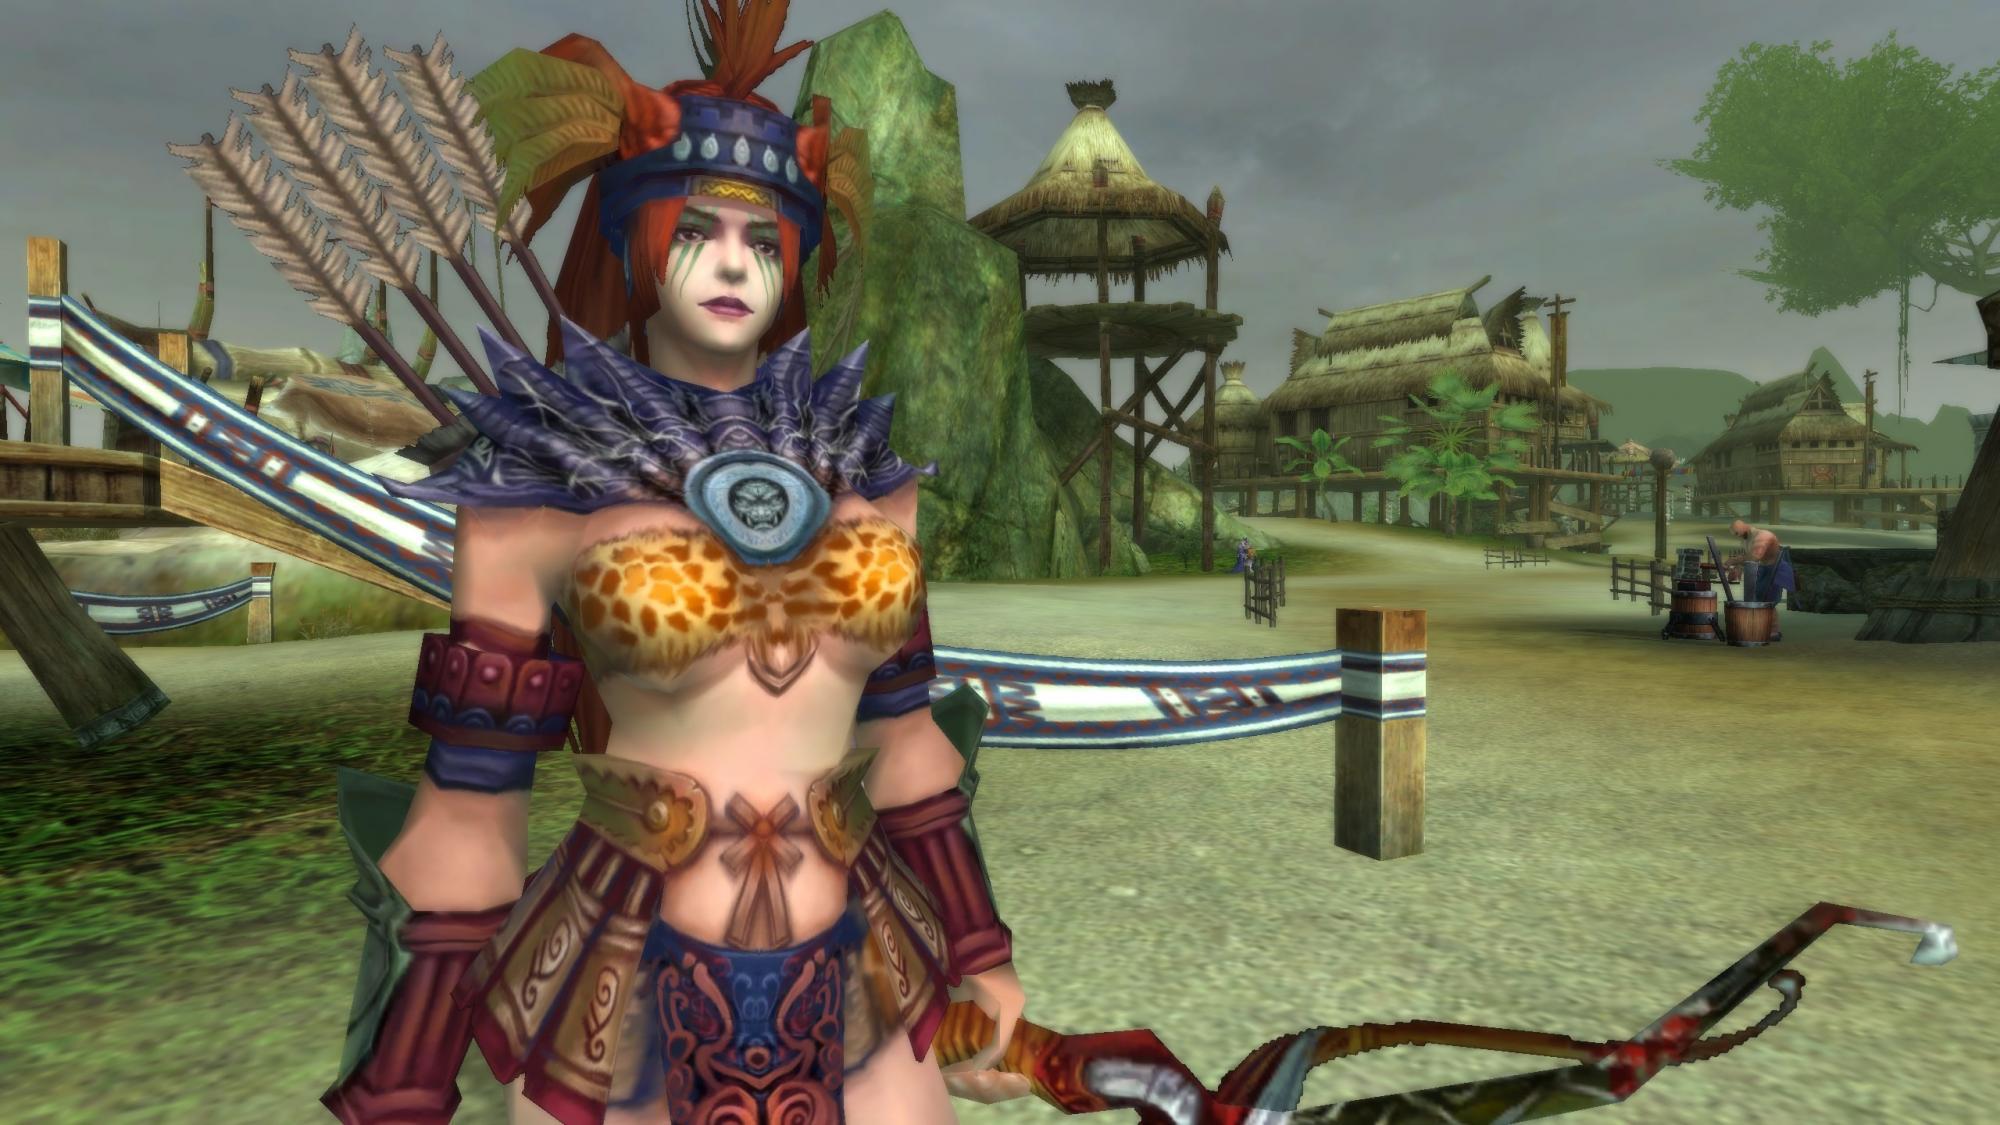 Click image for larger version.Name:Heroes of Three Kingdoms 4.jpgViews:163Size:252.8 KBID:801